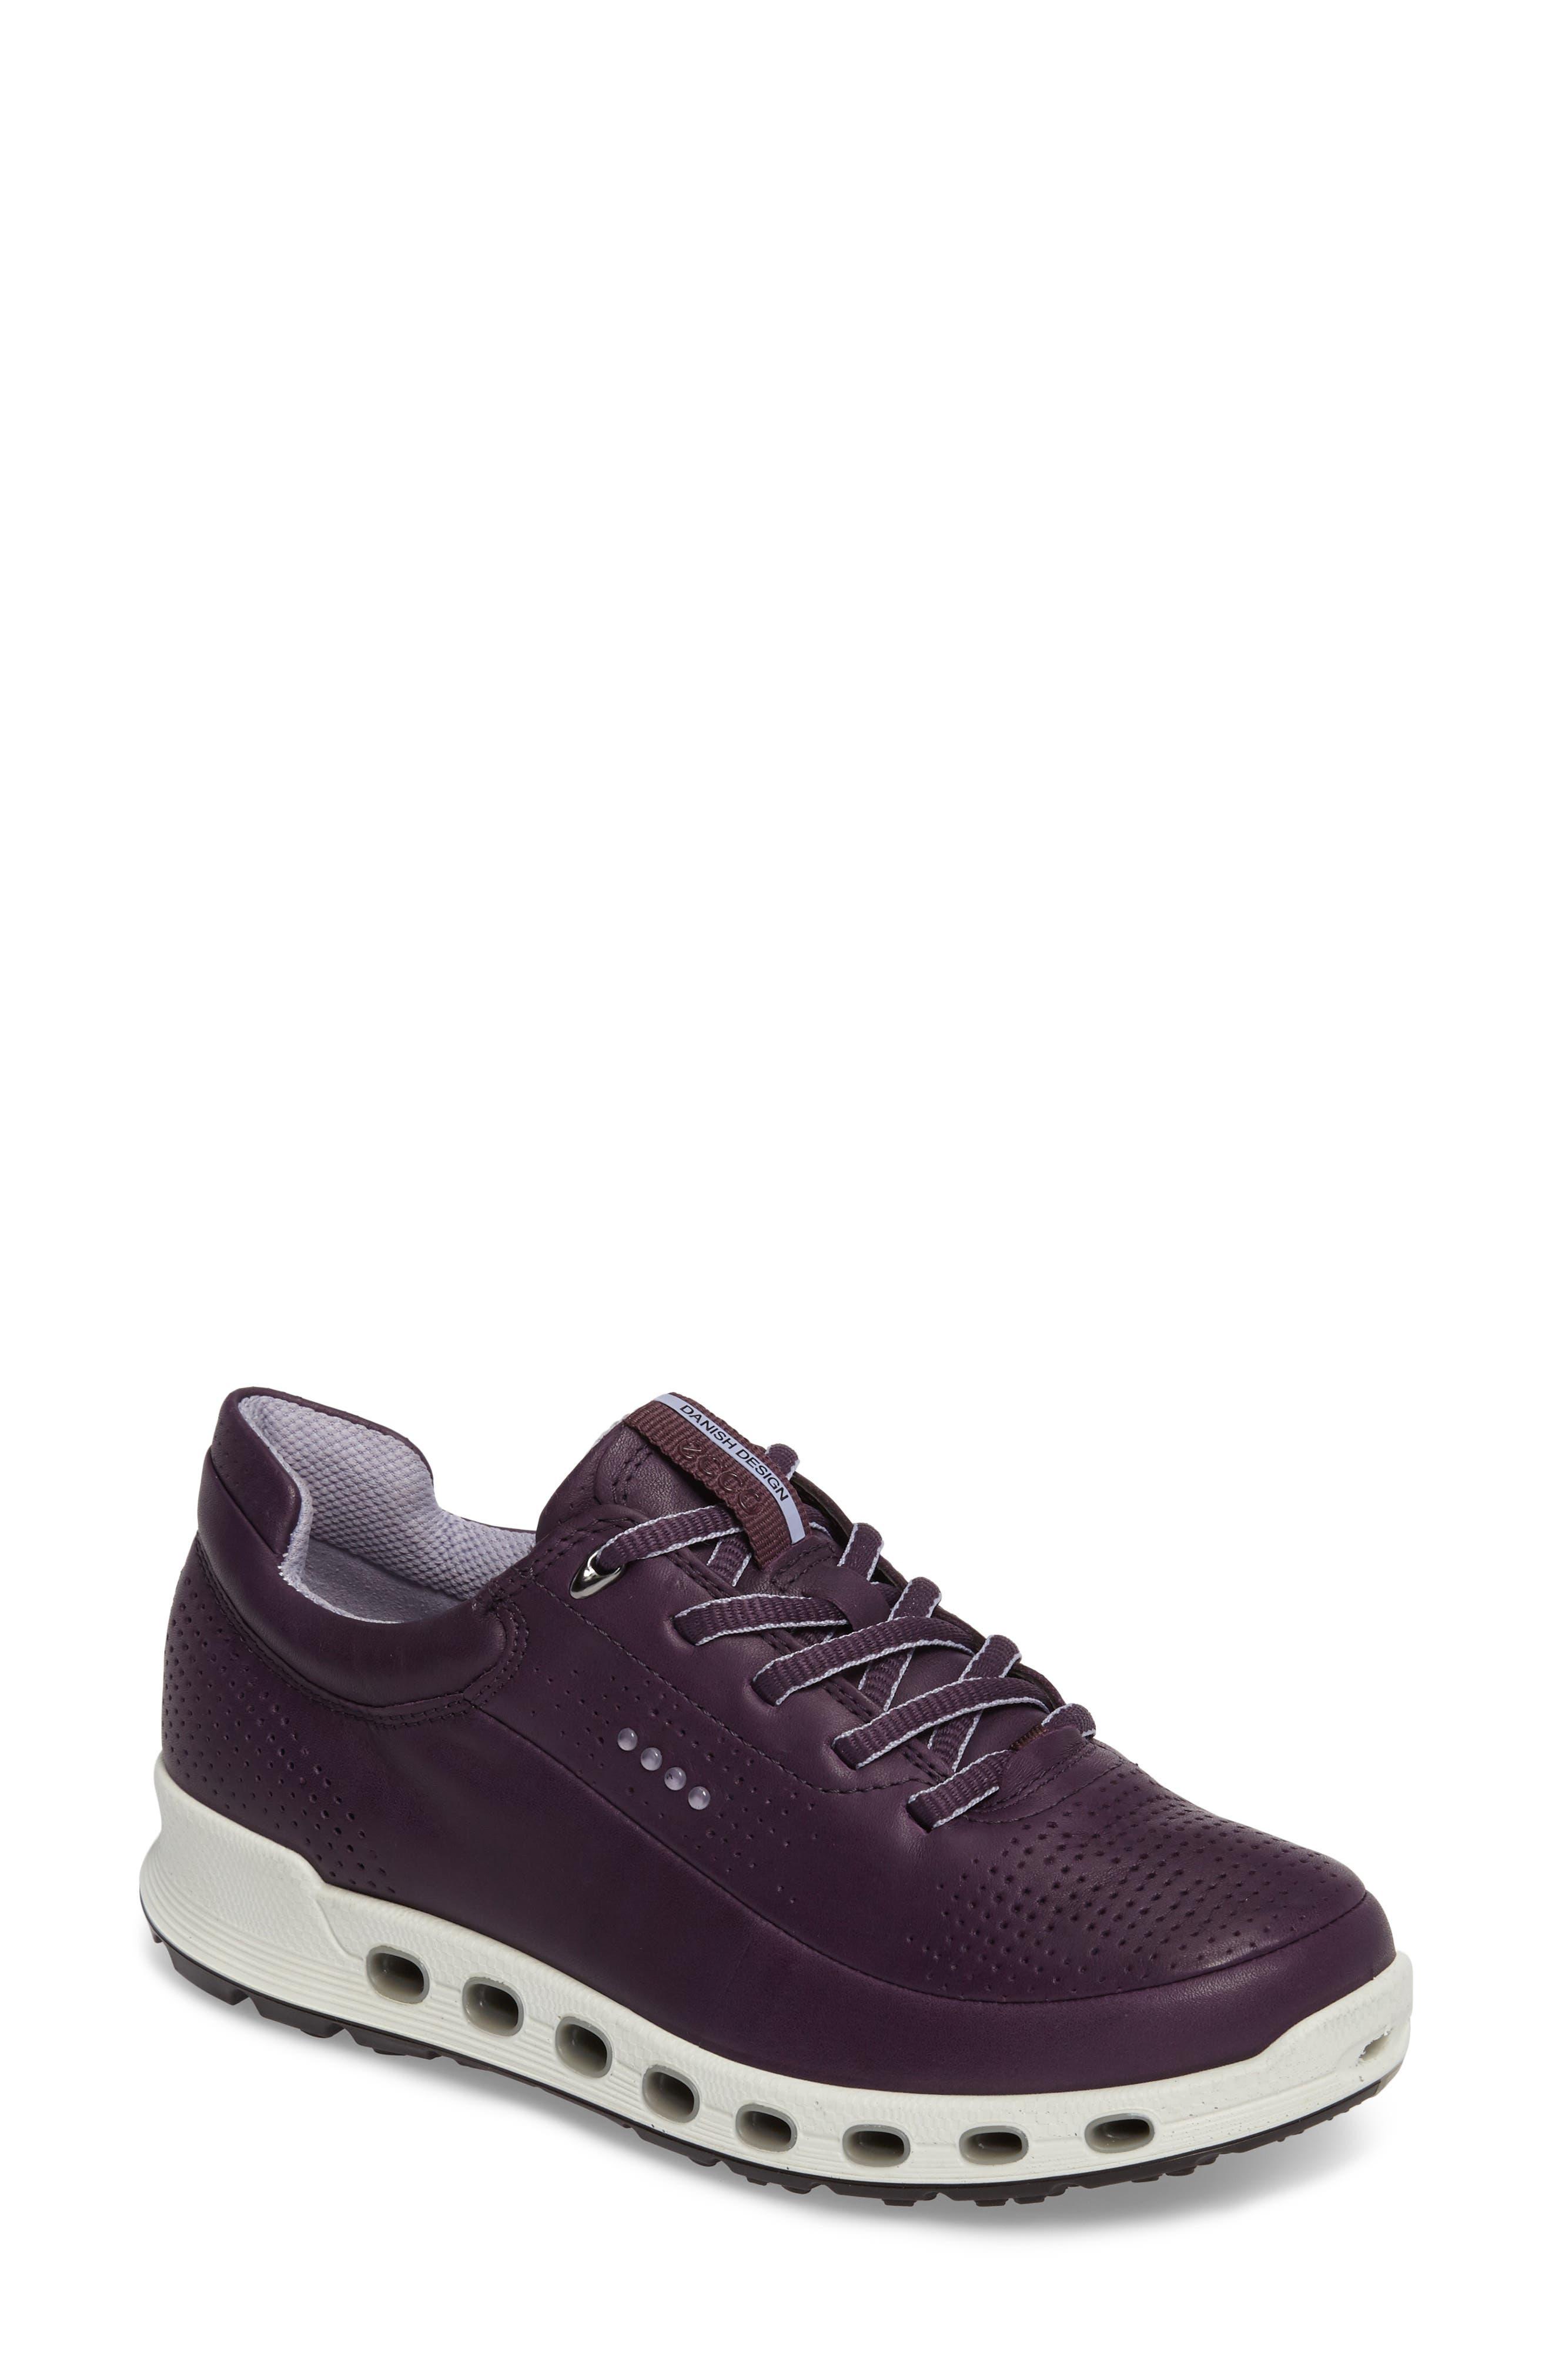 Cool 2.0 GTX Waterproof Sneaker,                             Main thumbnail 1, color,                             500